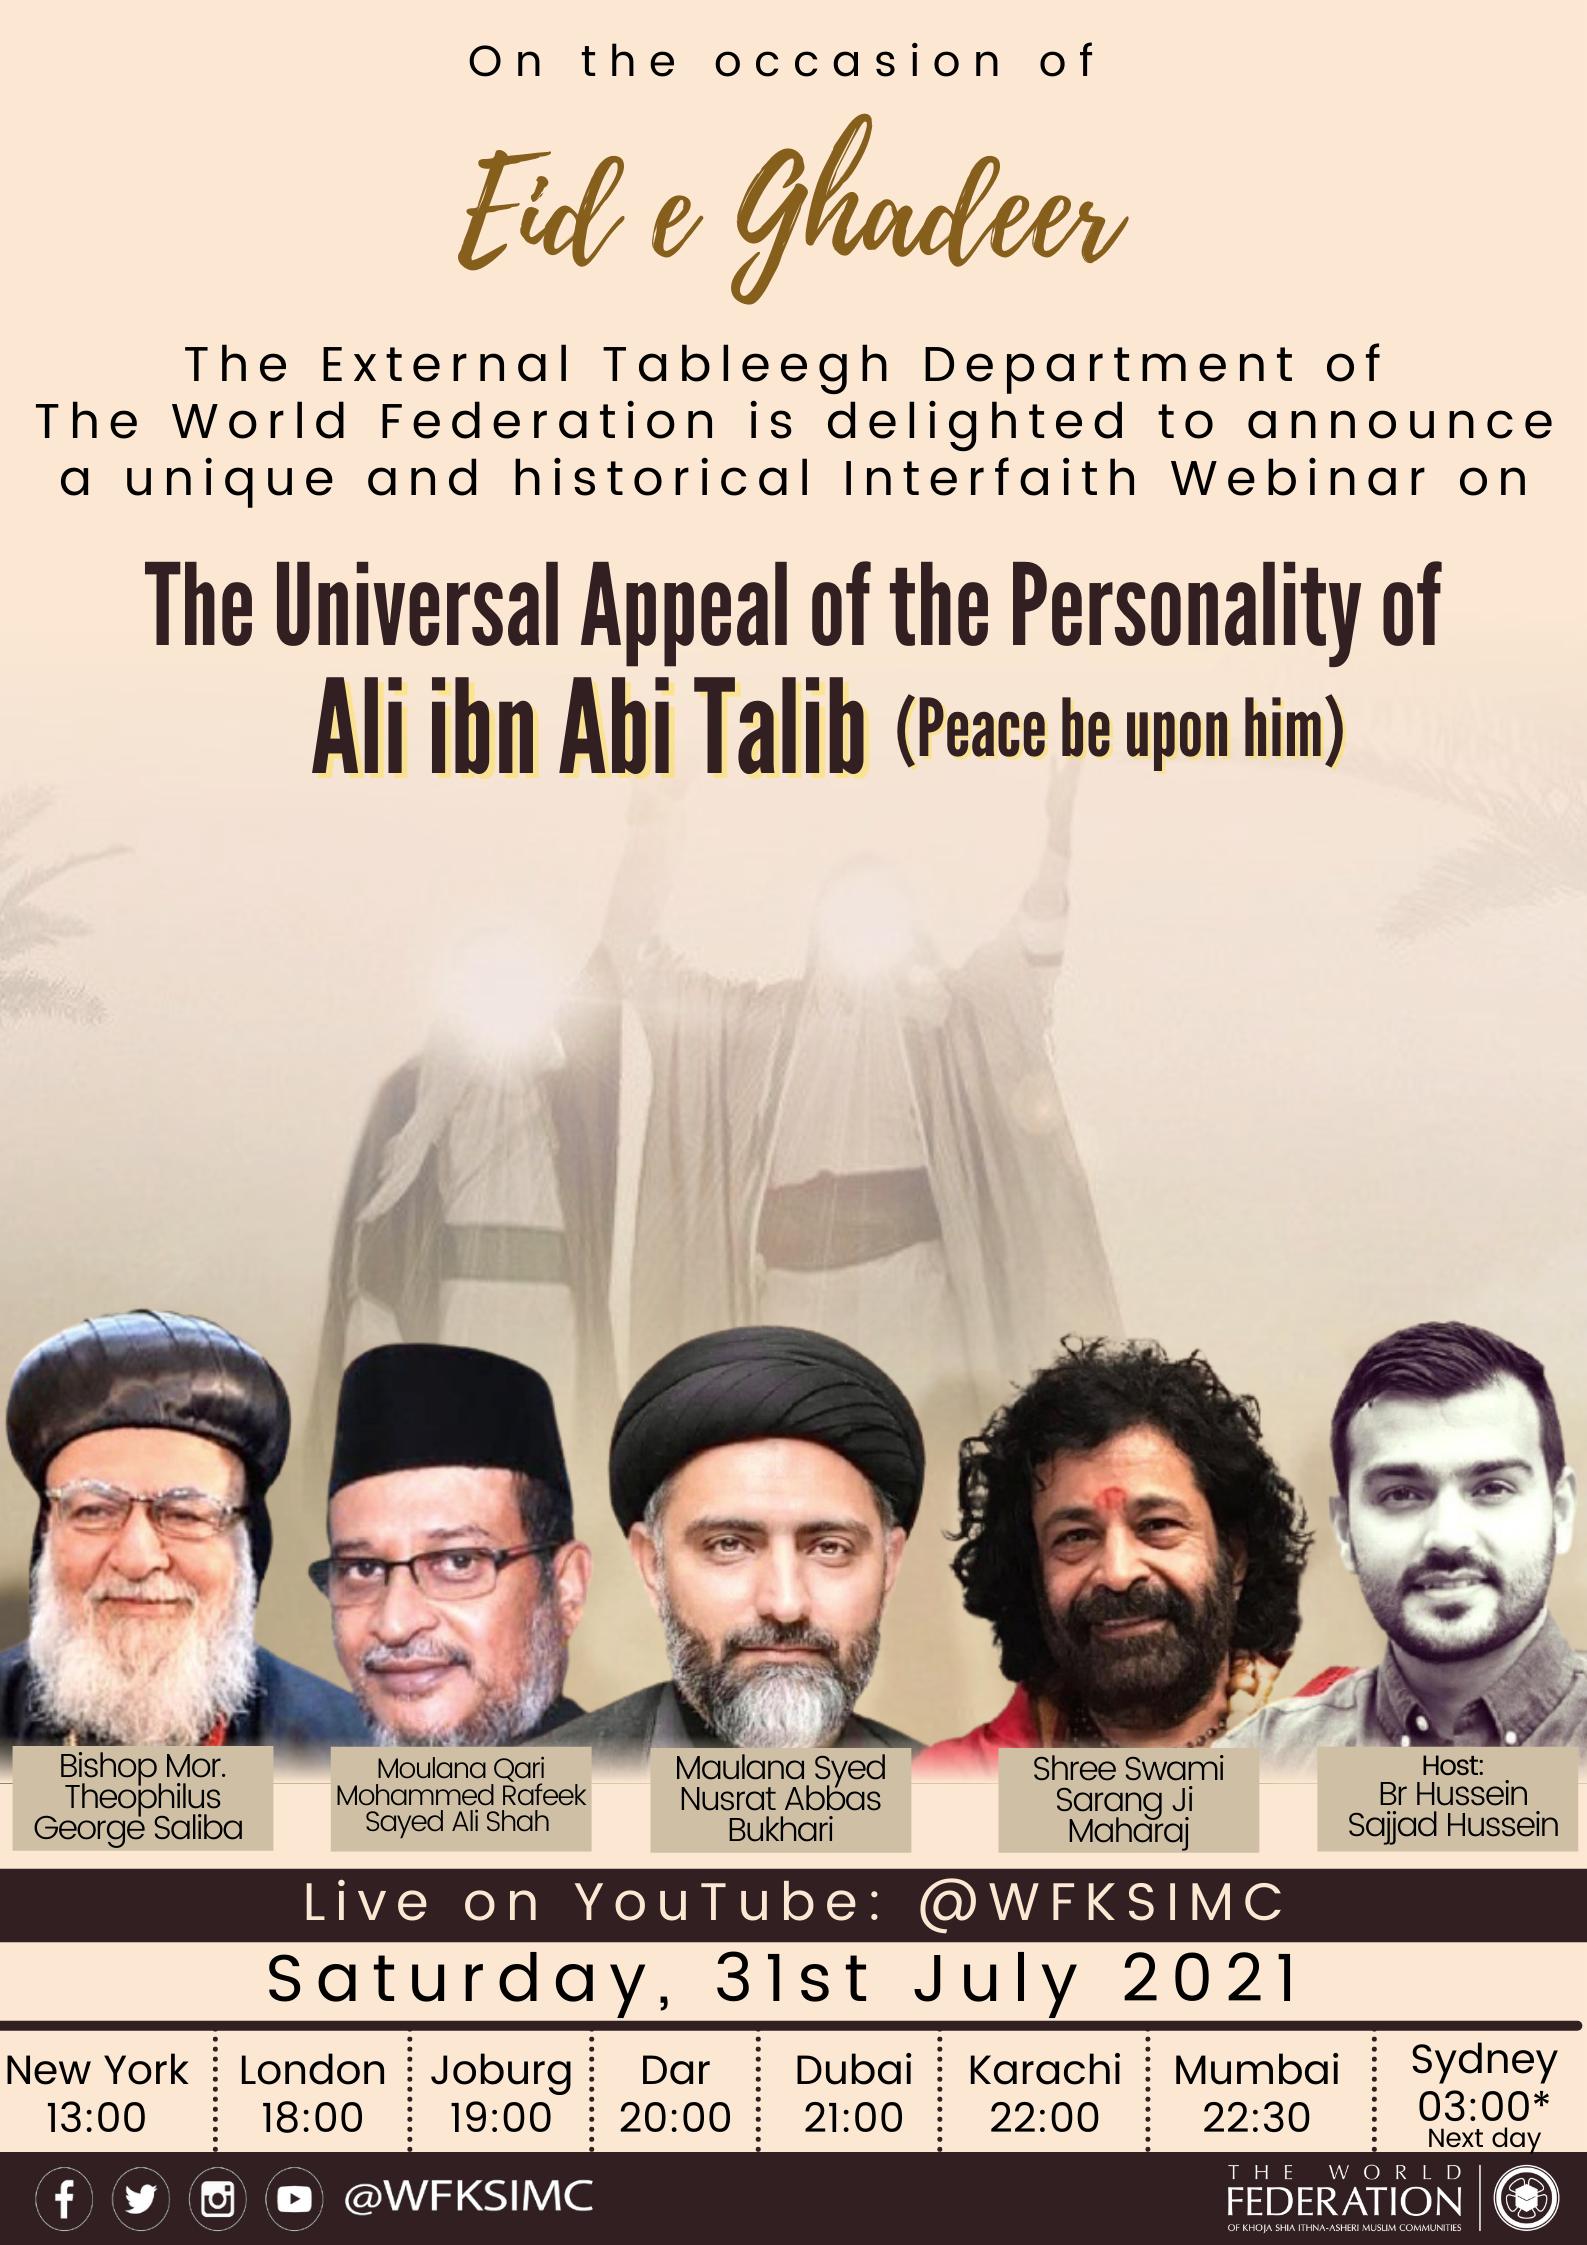 Eid Ghadeer Interfaith Webinar